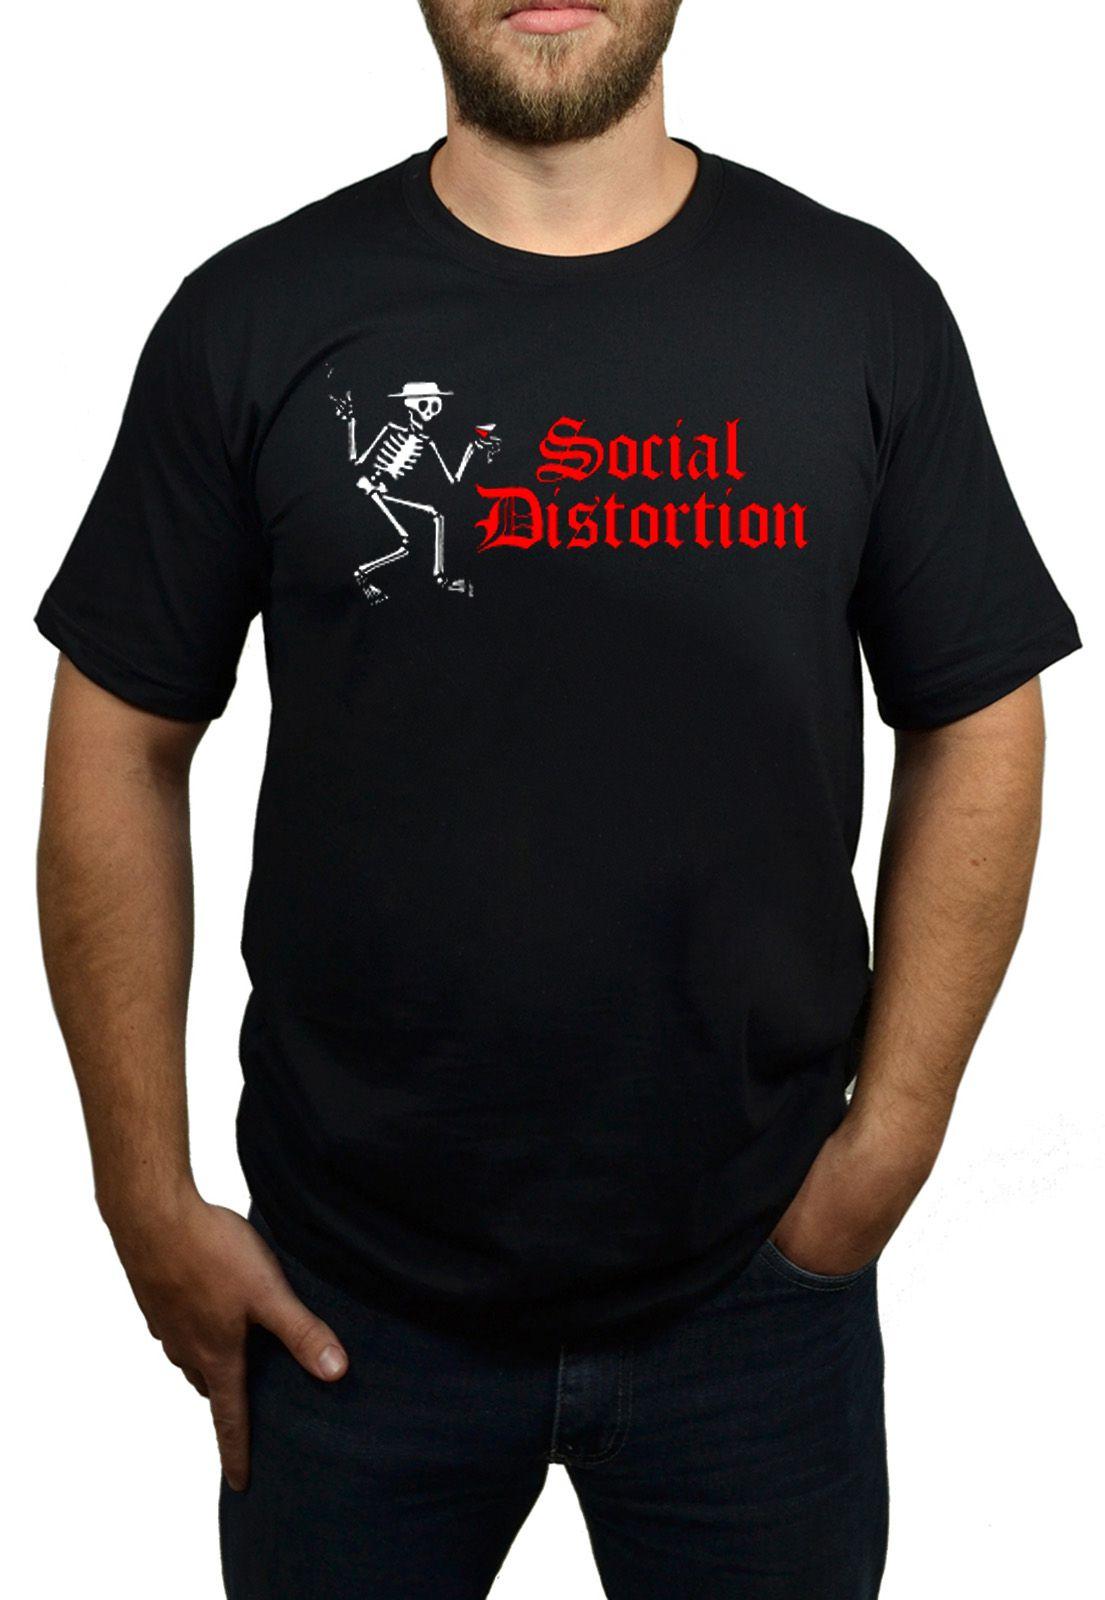 Camiseta Social Distortion - Tamanho M  - HShop